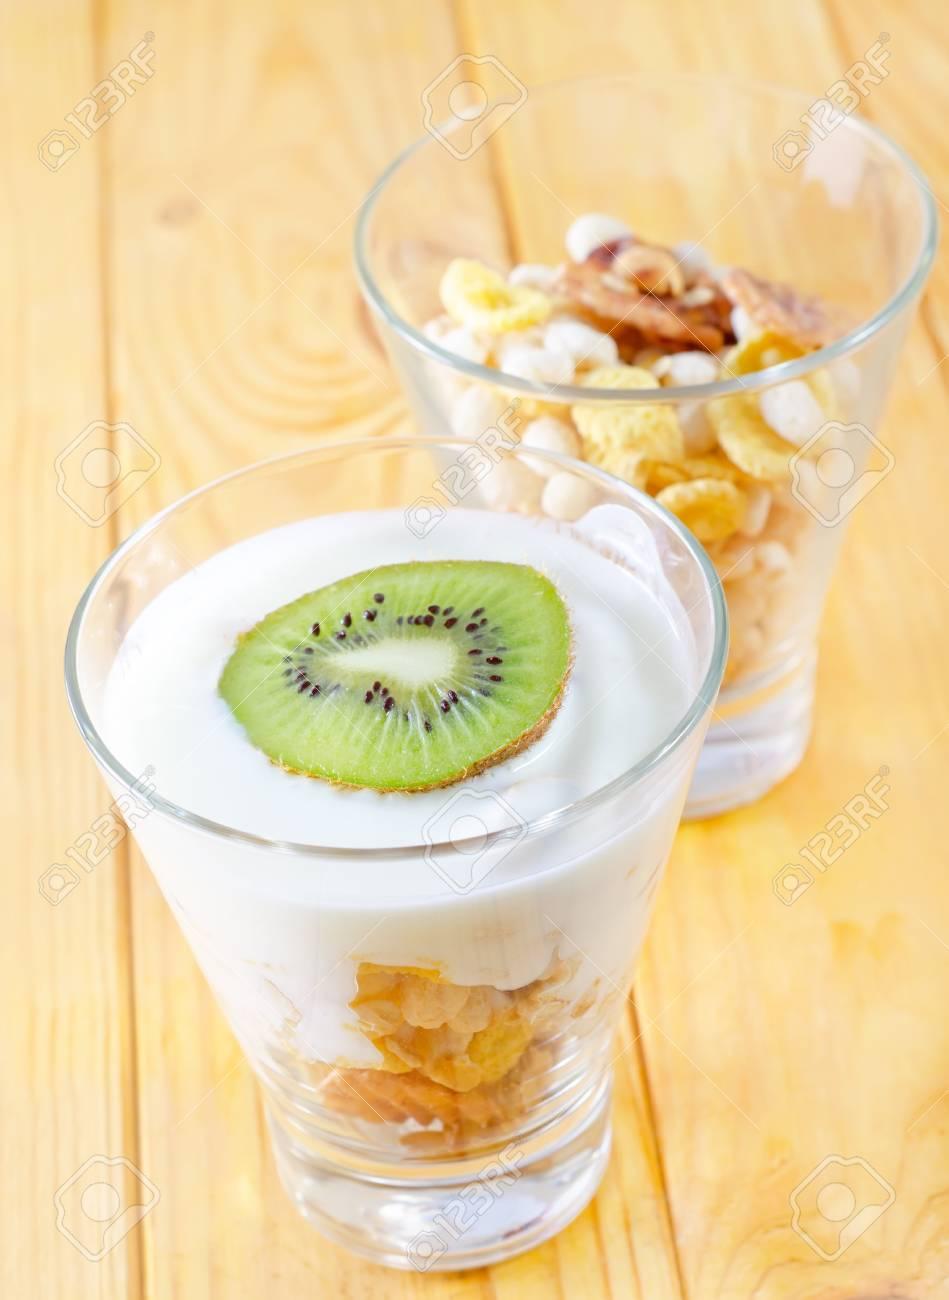 fresh yogurt and muesli in a glass Stock Photo - 17248612